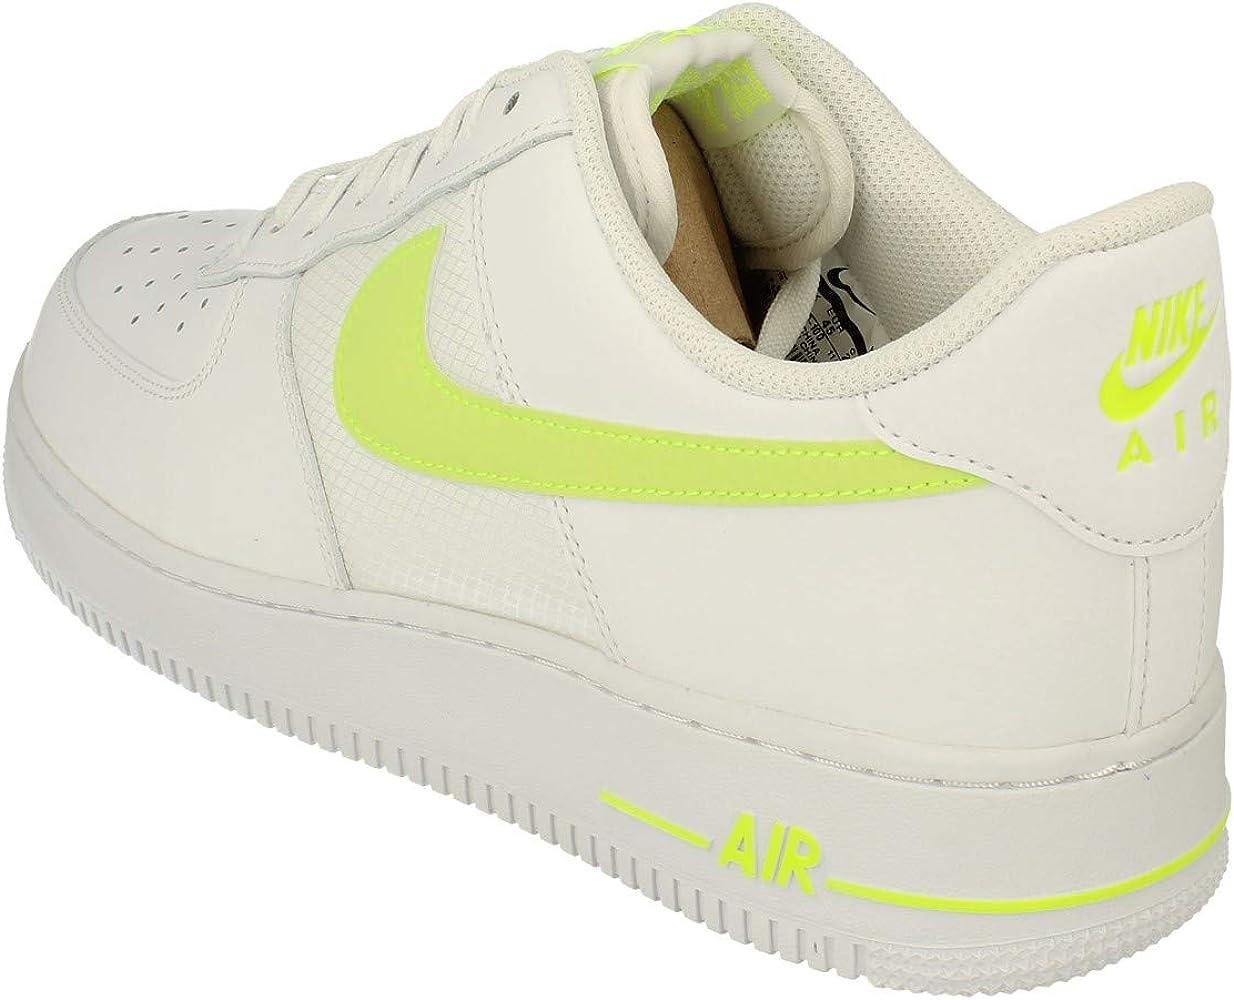 Air Force 1 07 LV8 Herren Trainers Cd1516 Sneakers Schuhe